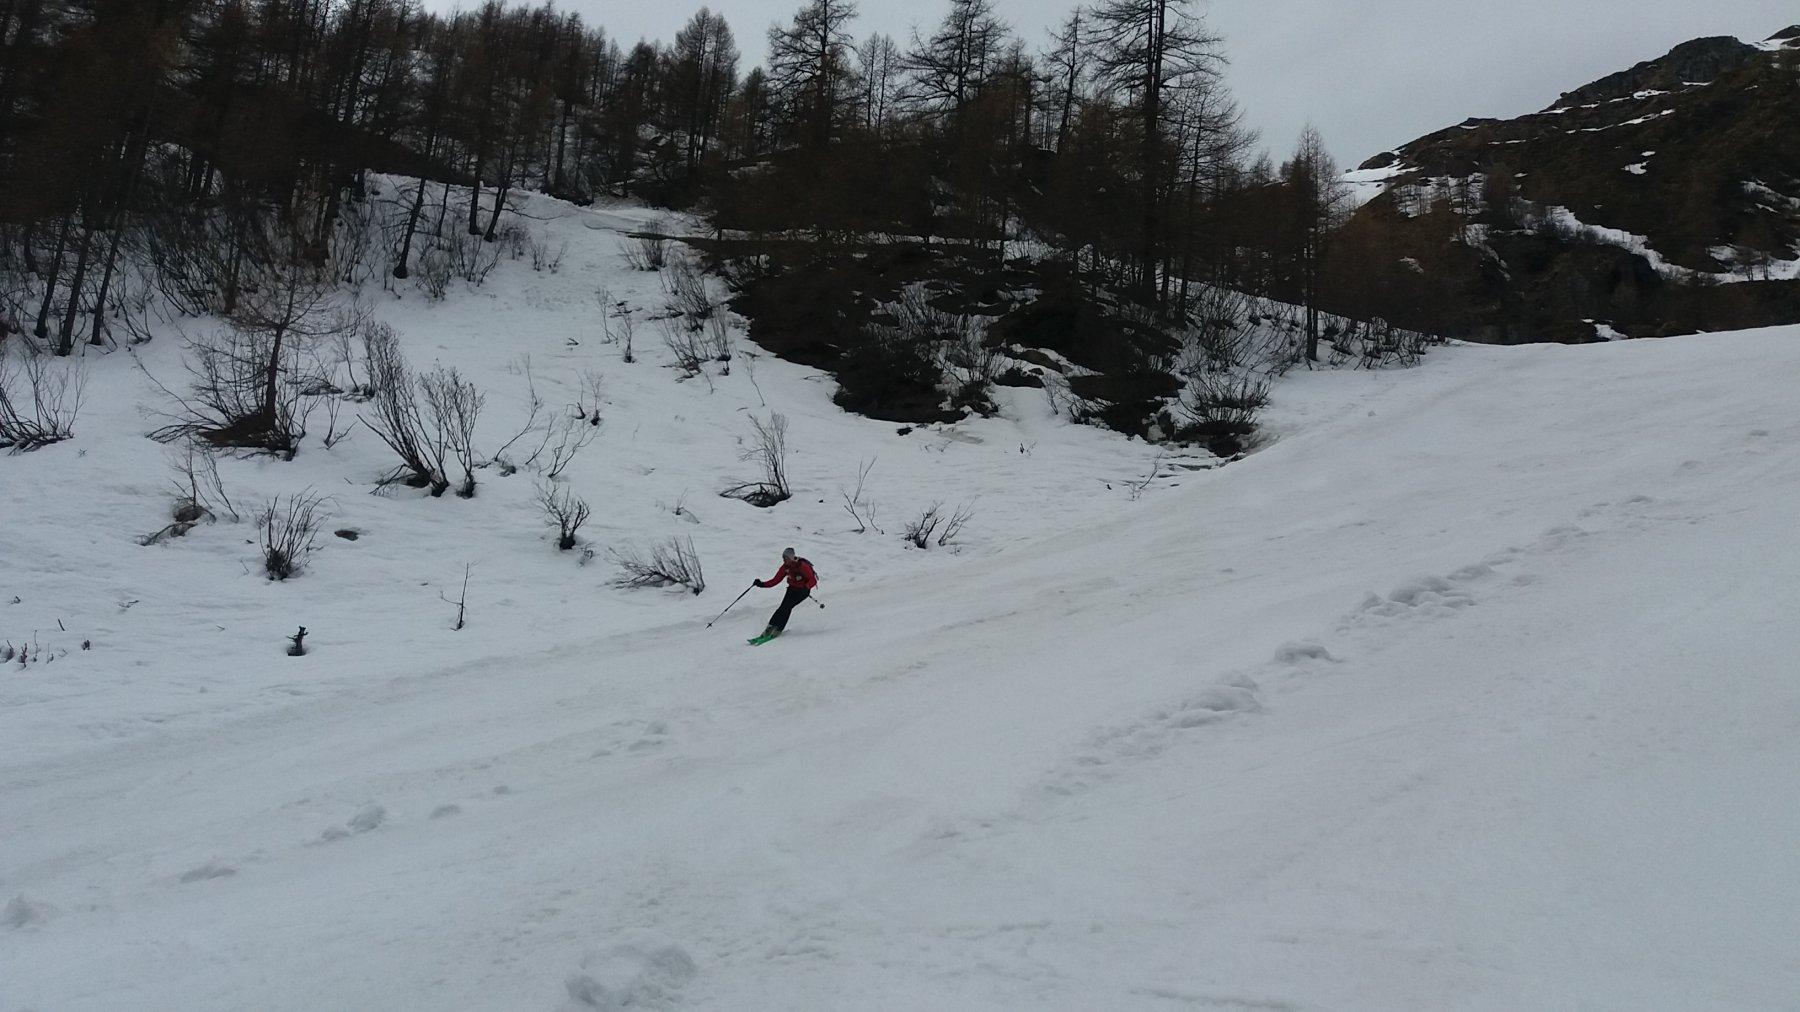 Discesa su neve primaverile molto divertente